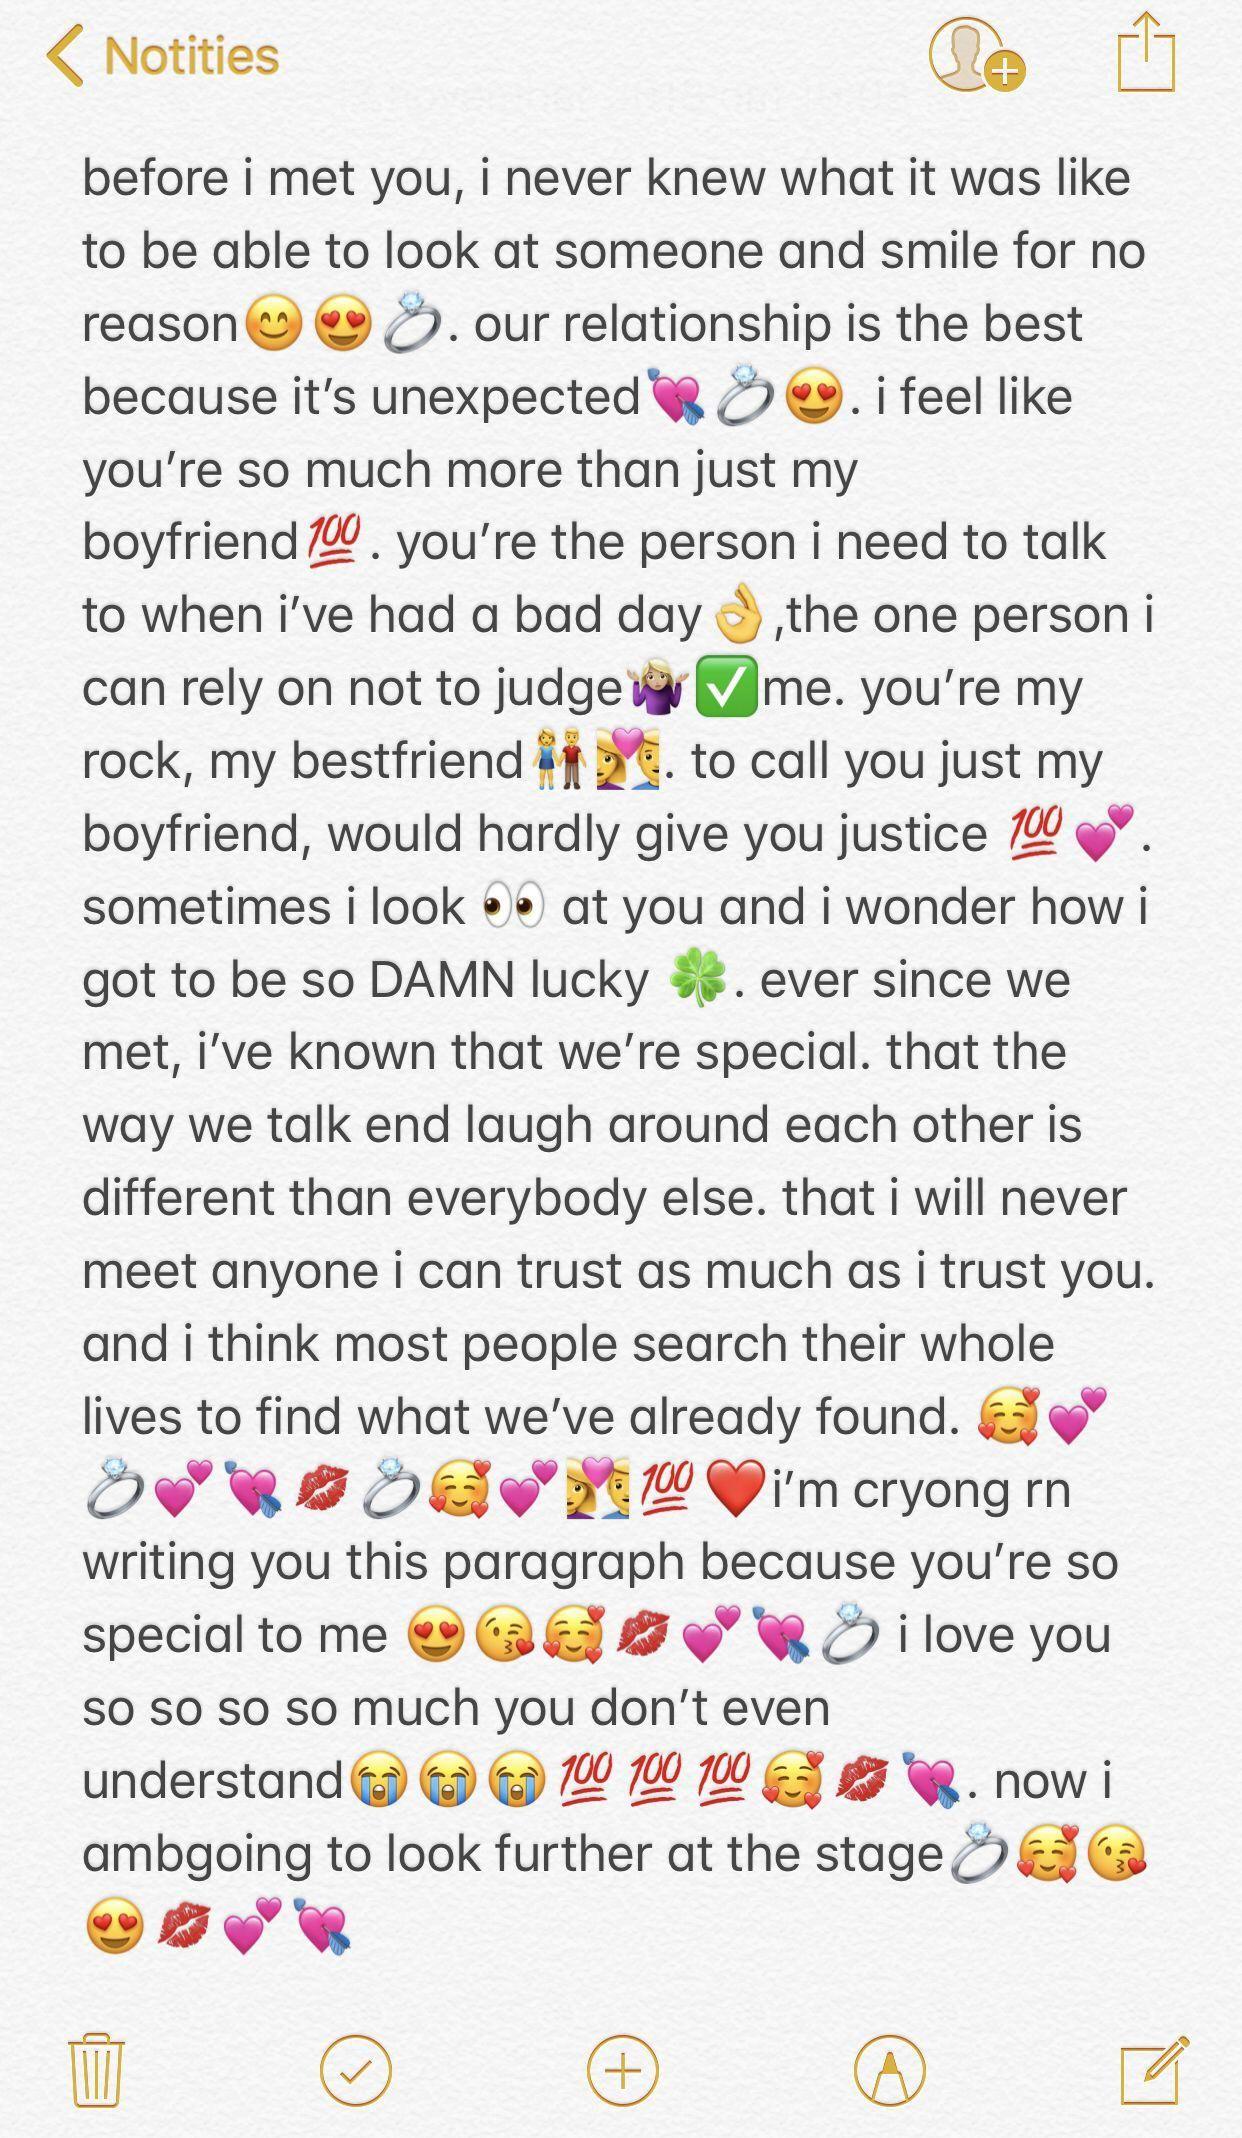 #lovequotesforboyfriend | Relationship texts, Paragraph